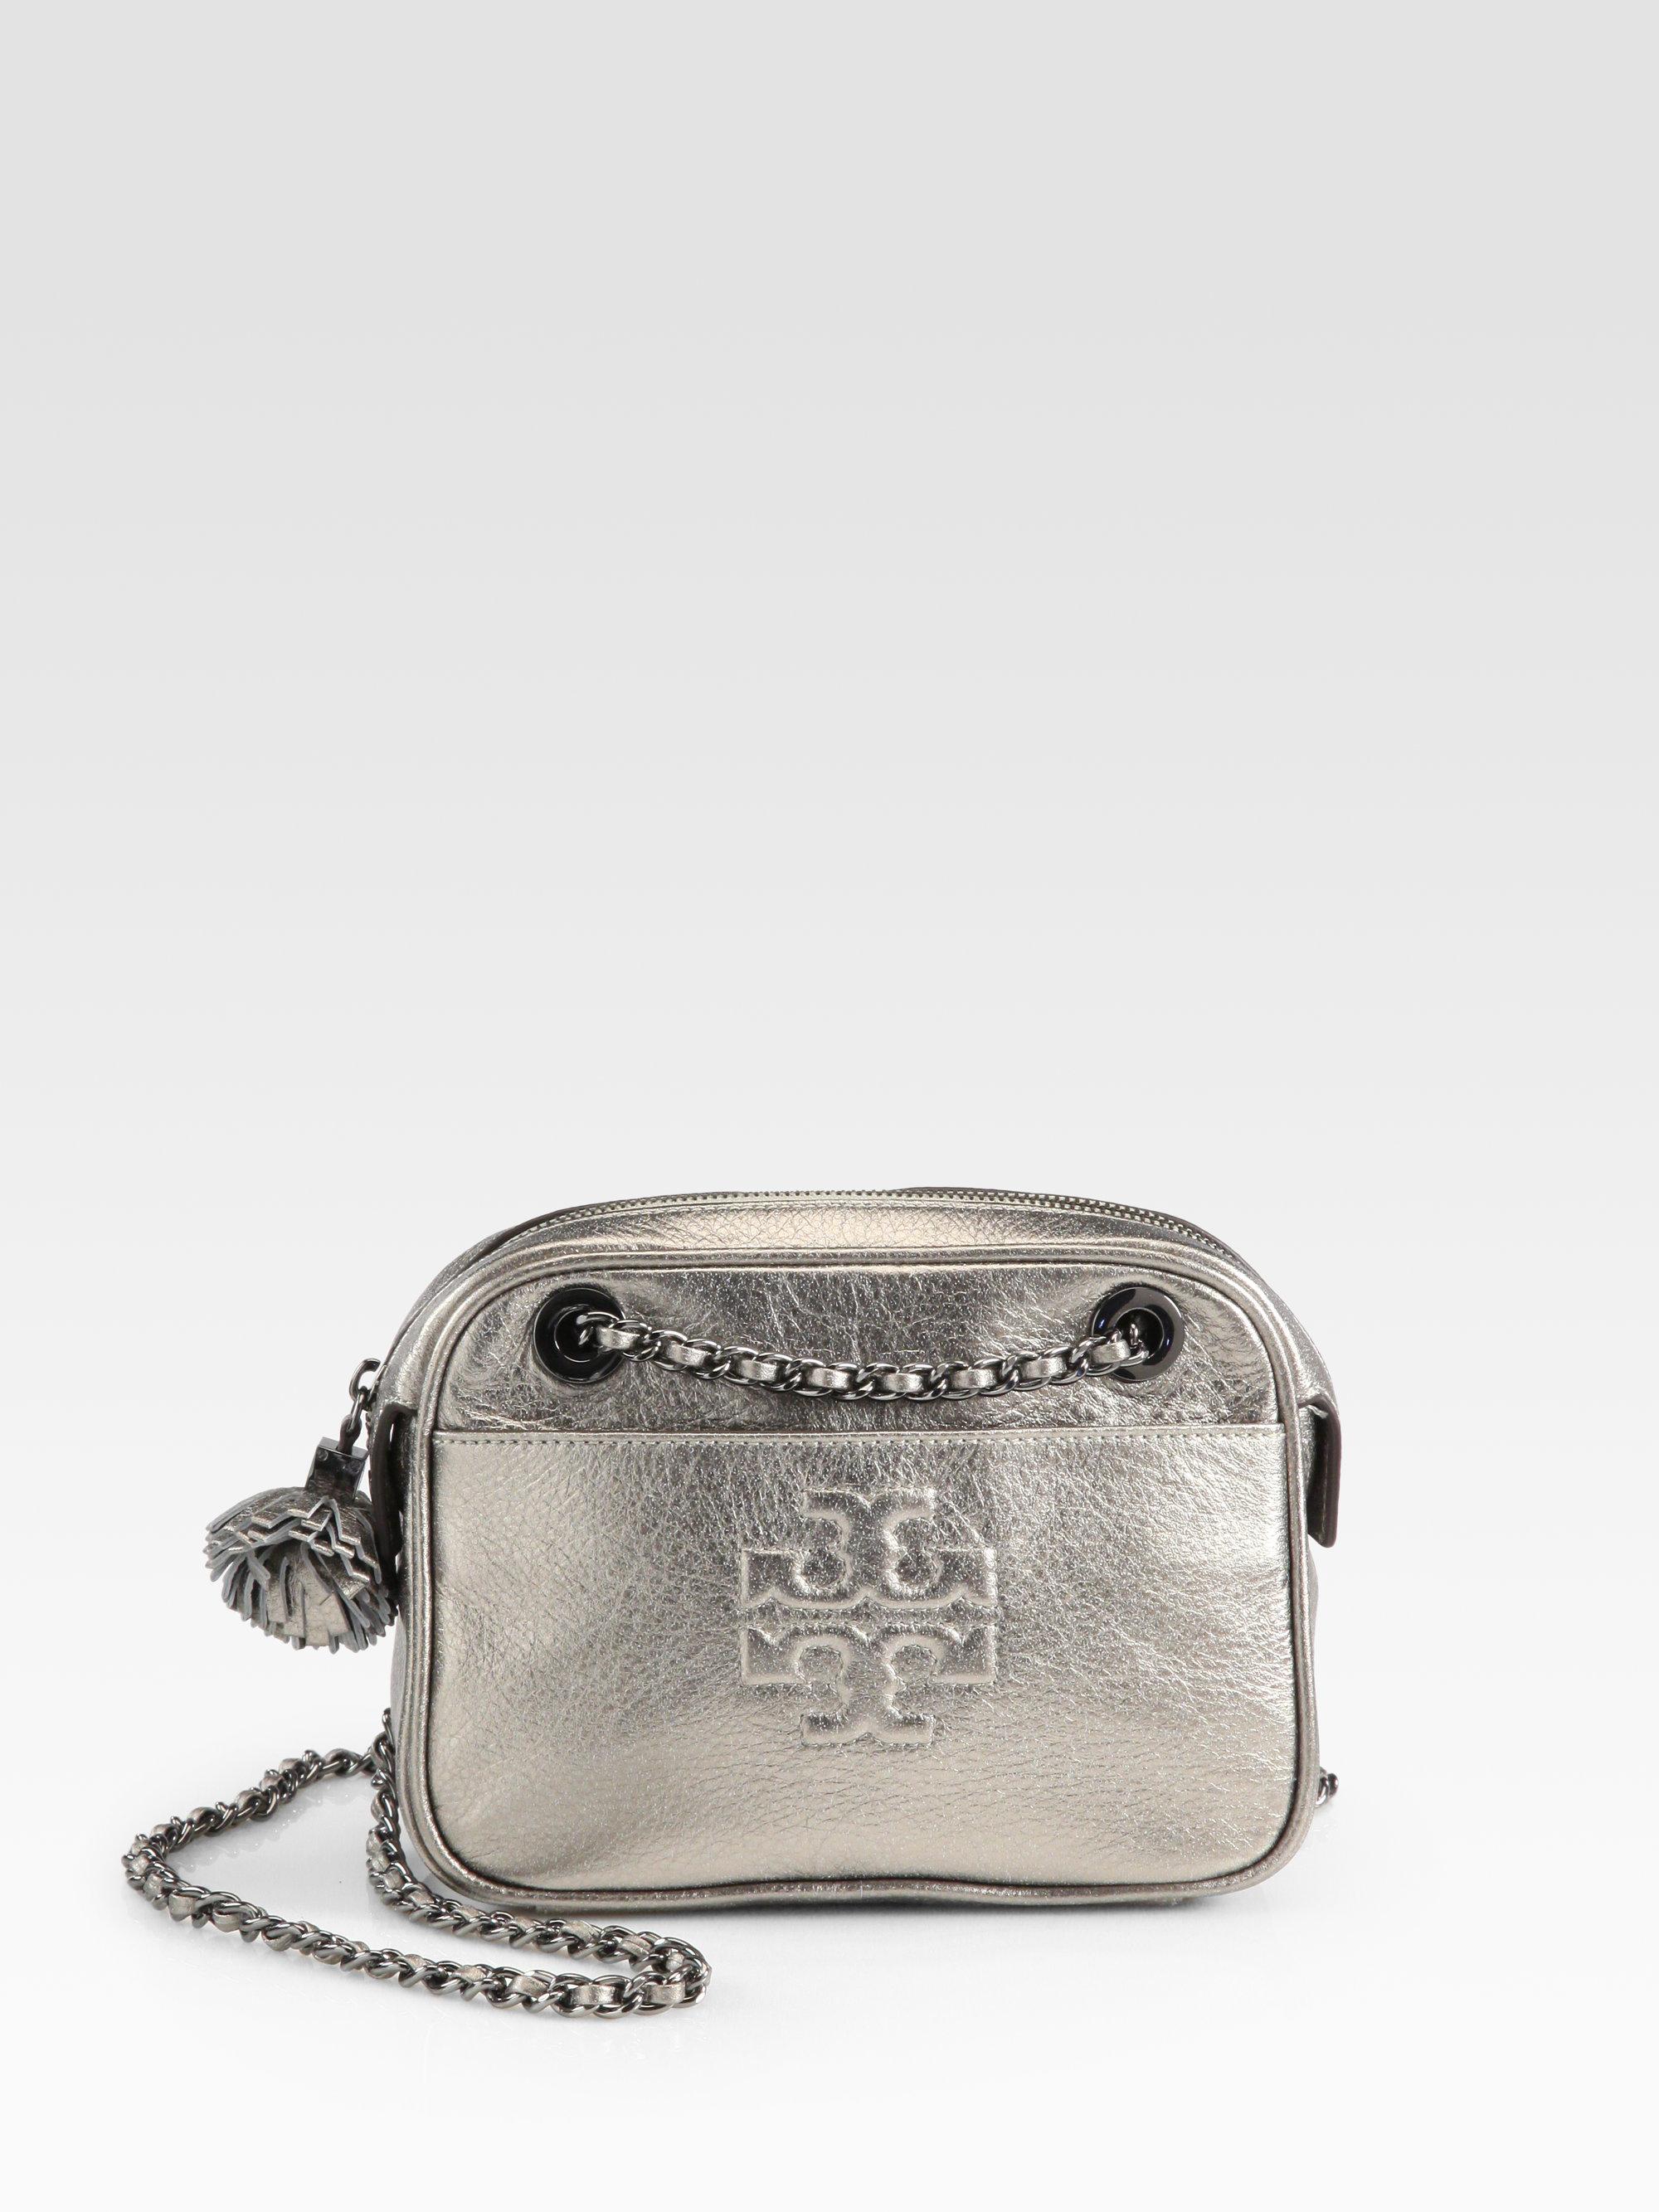 b07a6a10d8993 Lyst - Tory Burch Thea Metallic Crossbody Chain Bag in Metallic